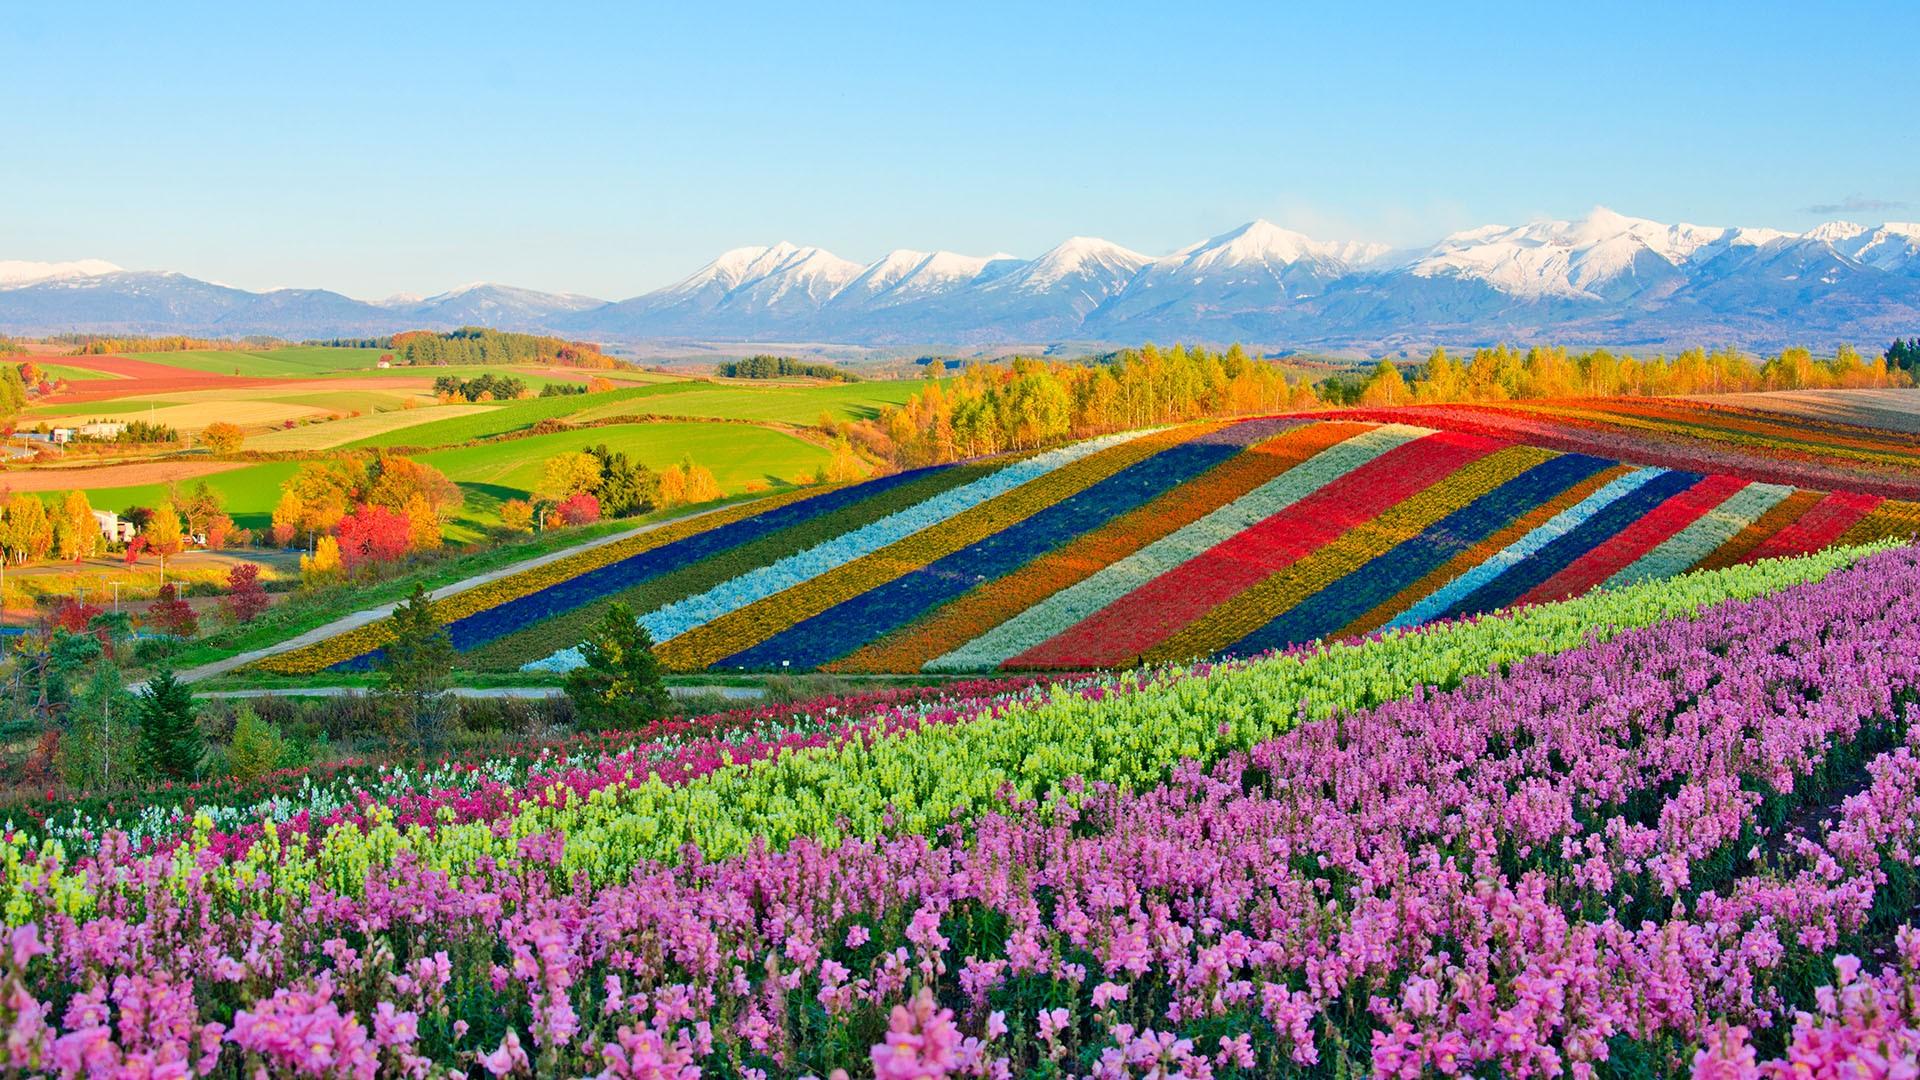 Japan Garden Flowers: Panoramic Flower Gardens Of Shikisai-no-oka Hill, Biei